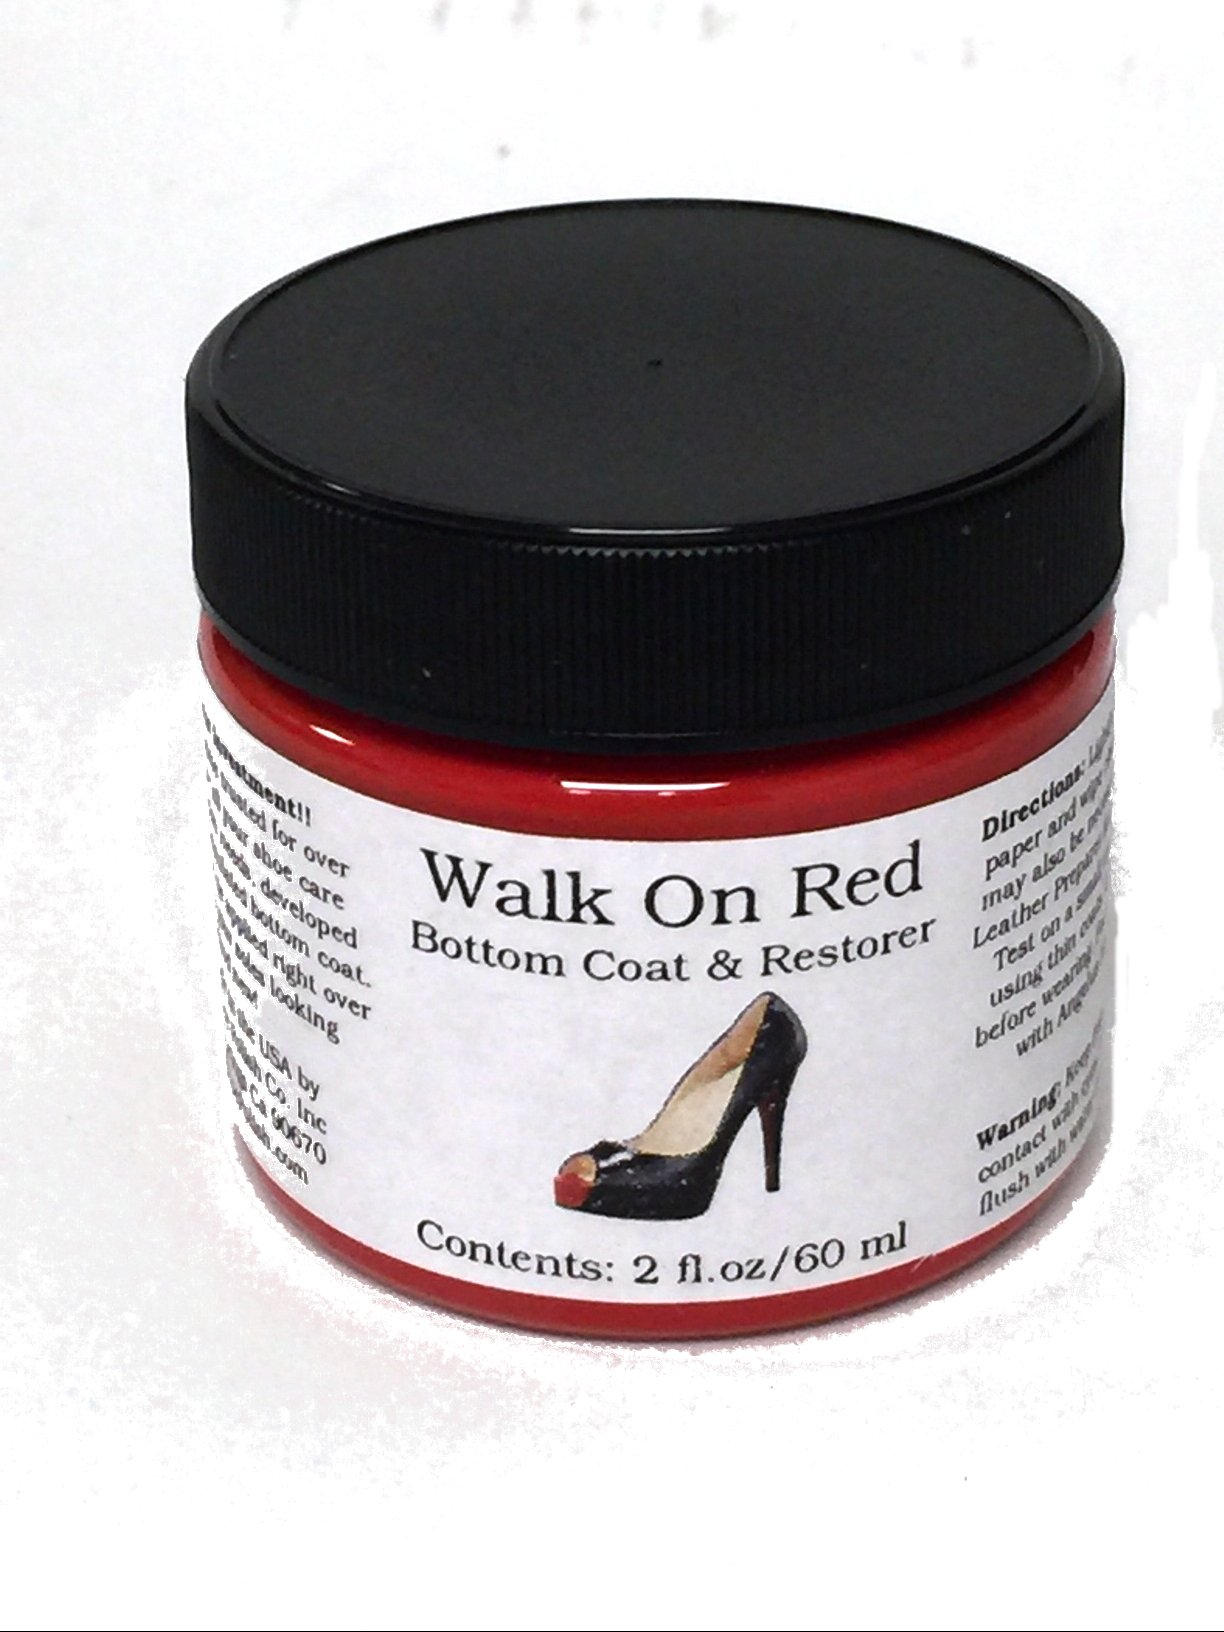 Walk On Red Bottom Coat & Restorer Angelus Brand, Pintura Ac